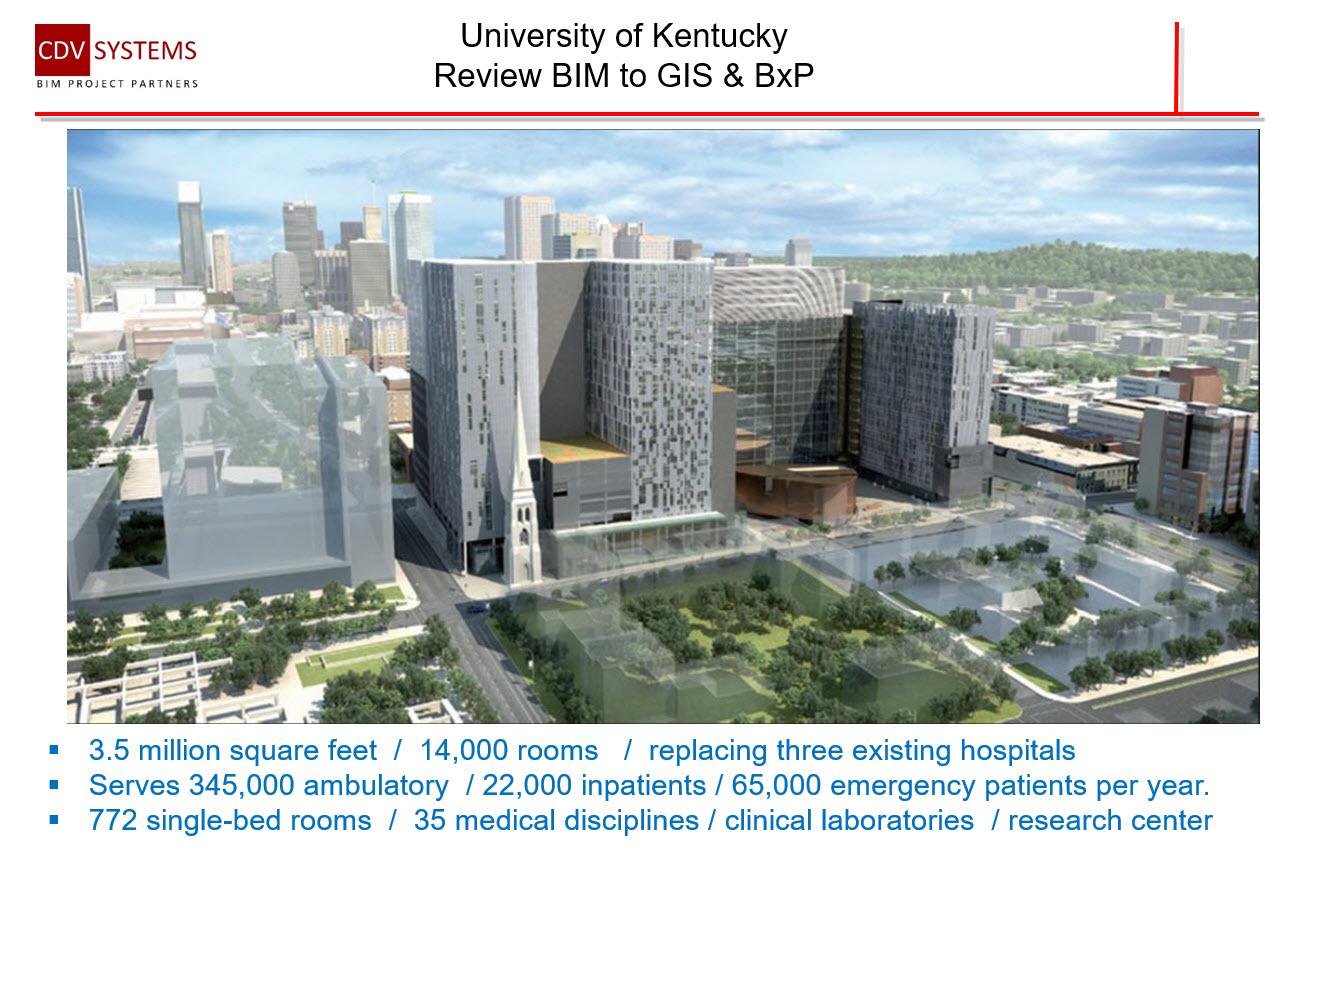 University of Kentucky_001s.jpg